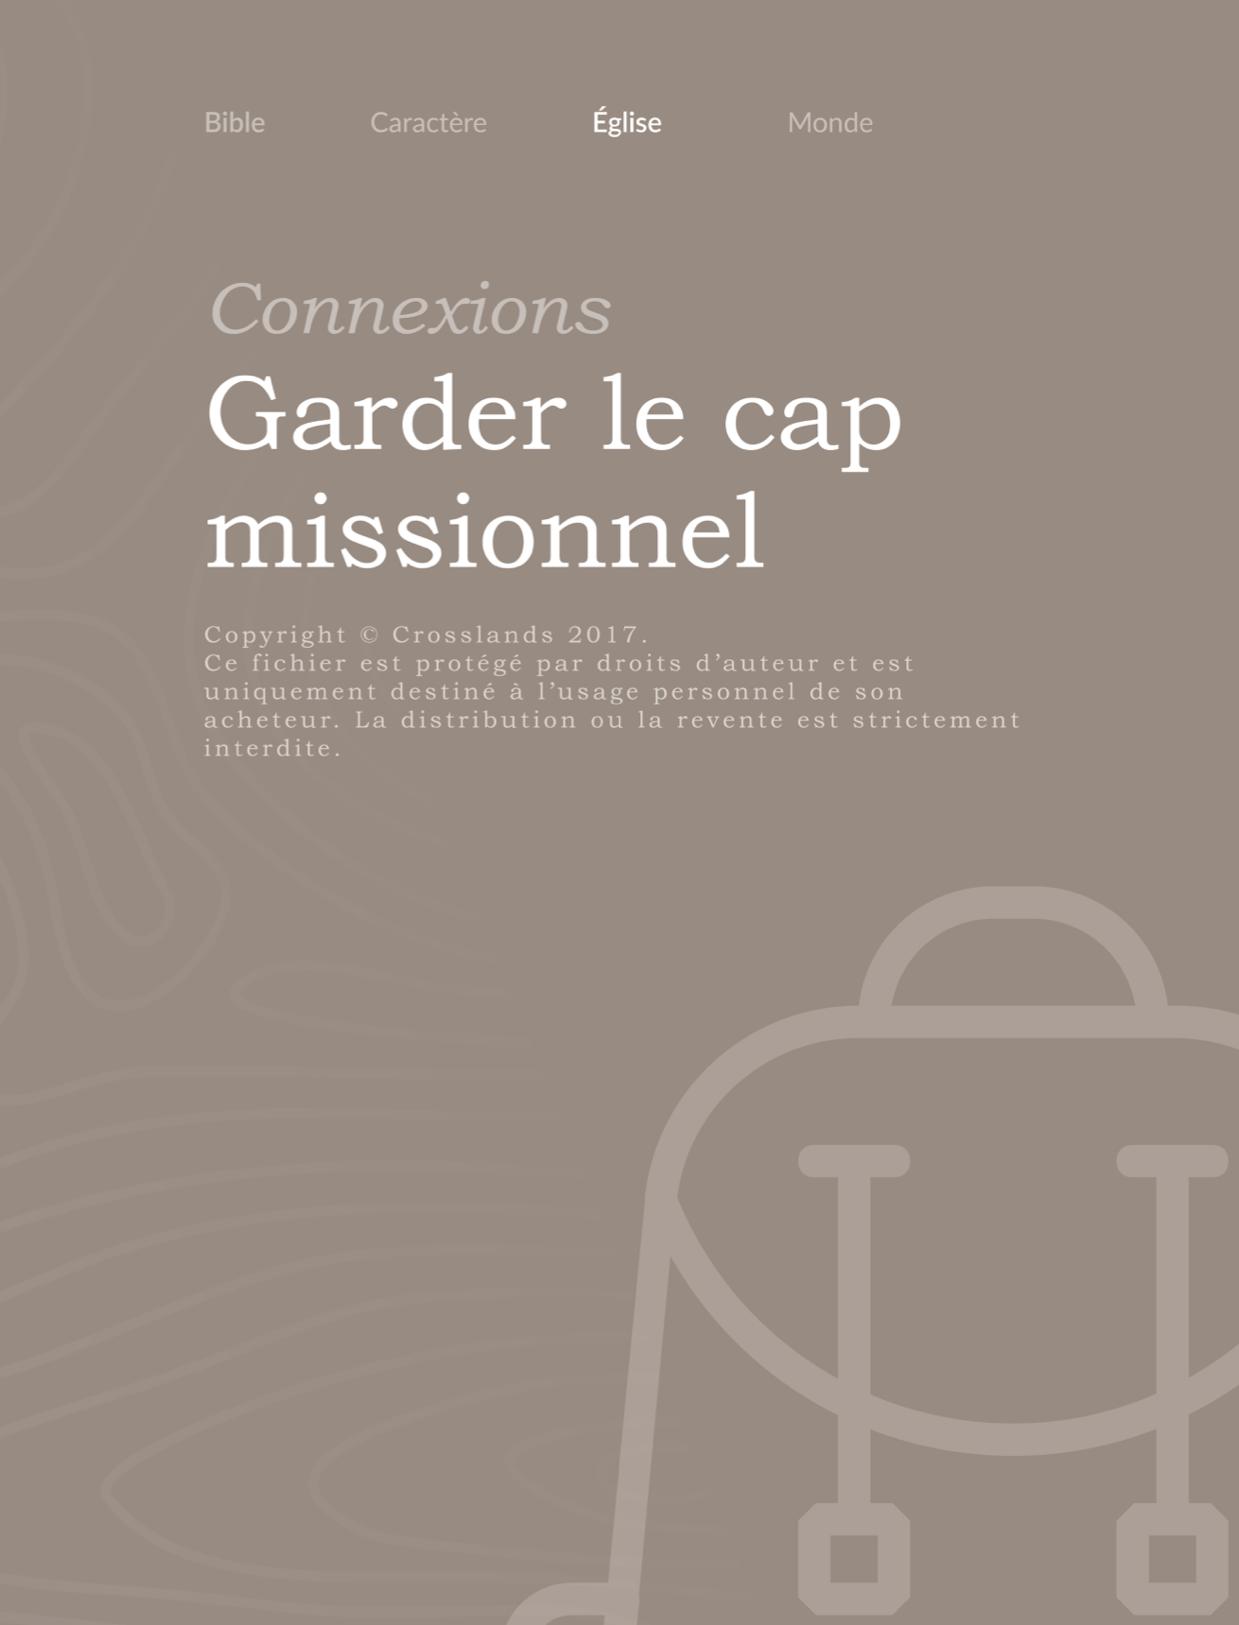 Garder le cap missionnel_sample_published.1.png